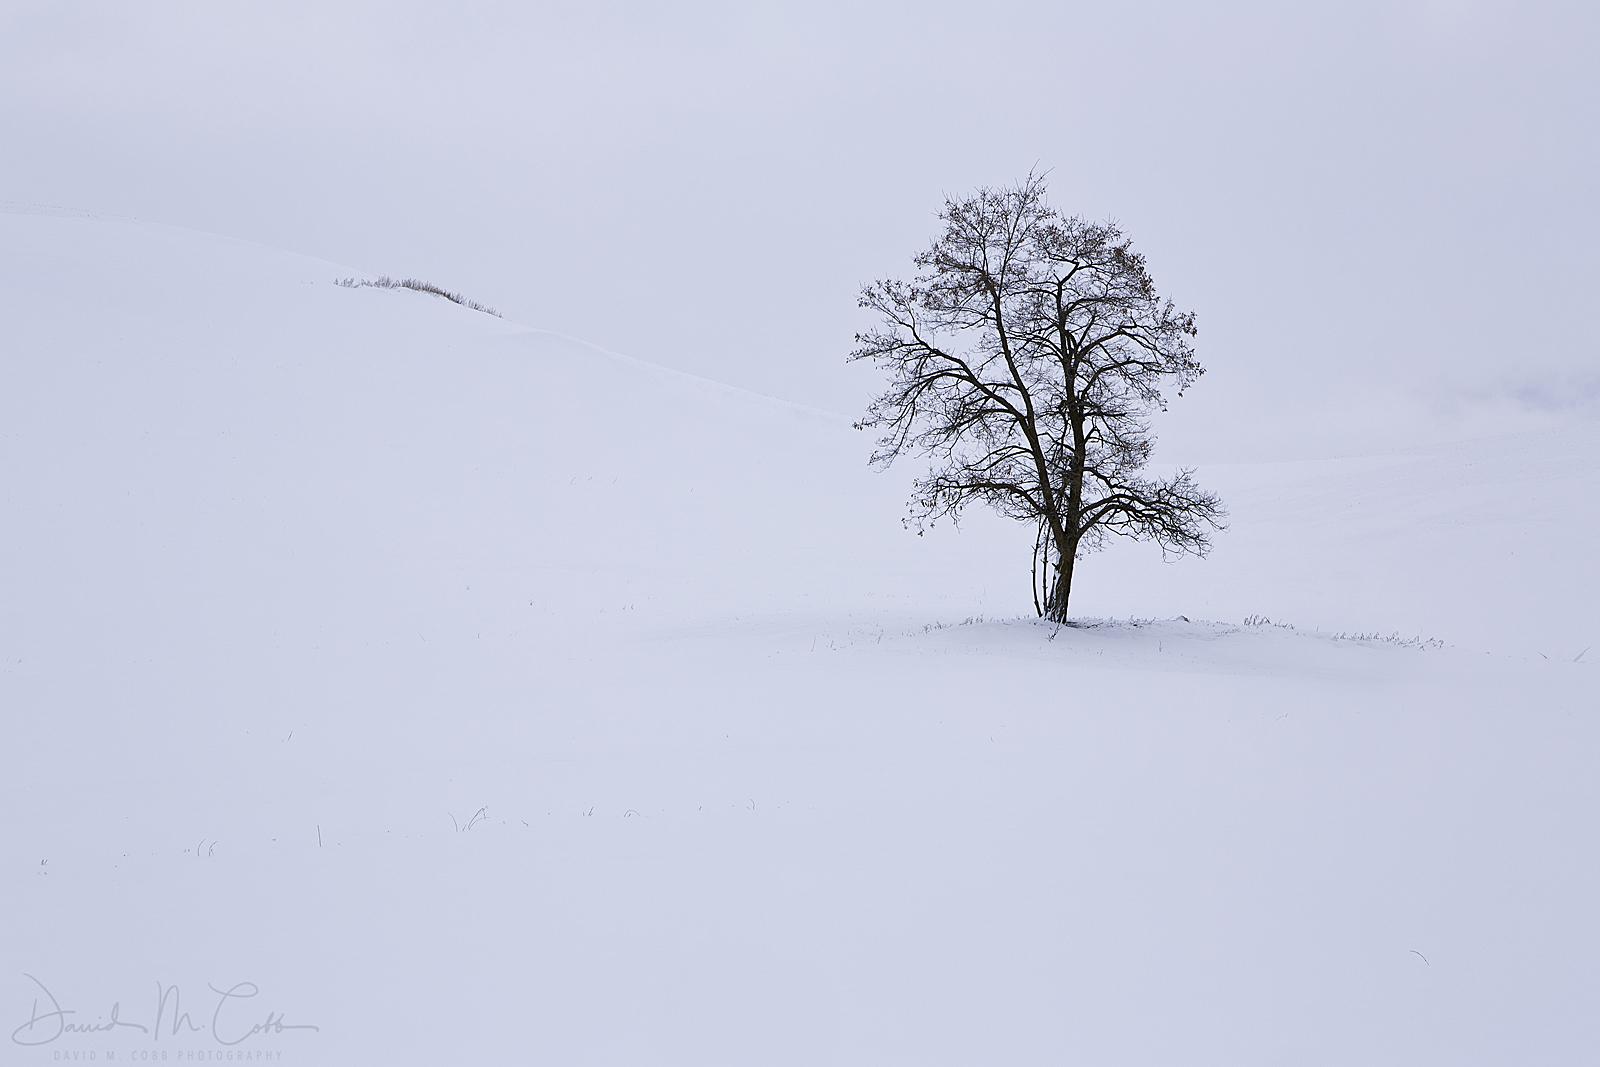 sky, winter, white, tree, lone tree, crop, crops, wheat, WA, Washington, agriculture, stormy, moody, Palouse, farm, farming, minimal, sparse, minimalist, photo